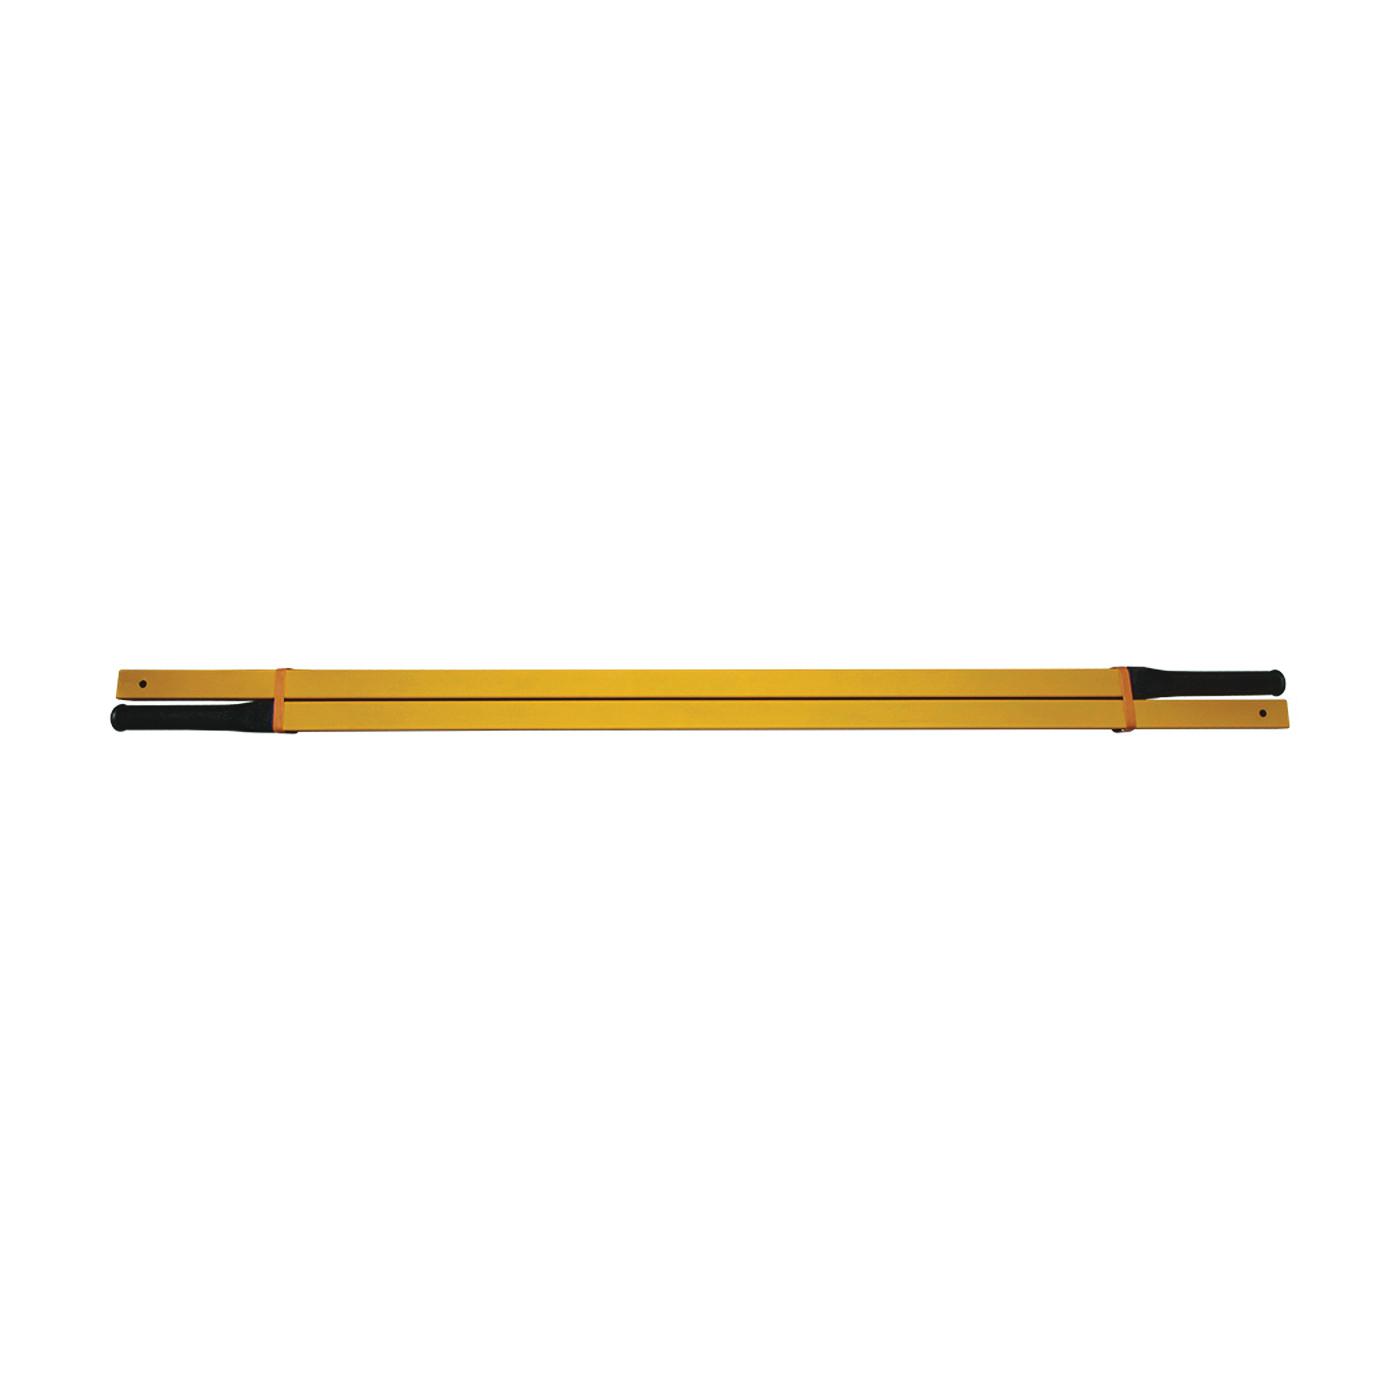 Picture of TRUE TEMPER 002244VB Wheelbarrow Handle, 60 in L, Steel, Amber